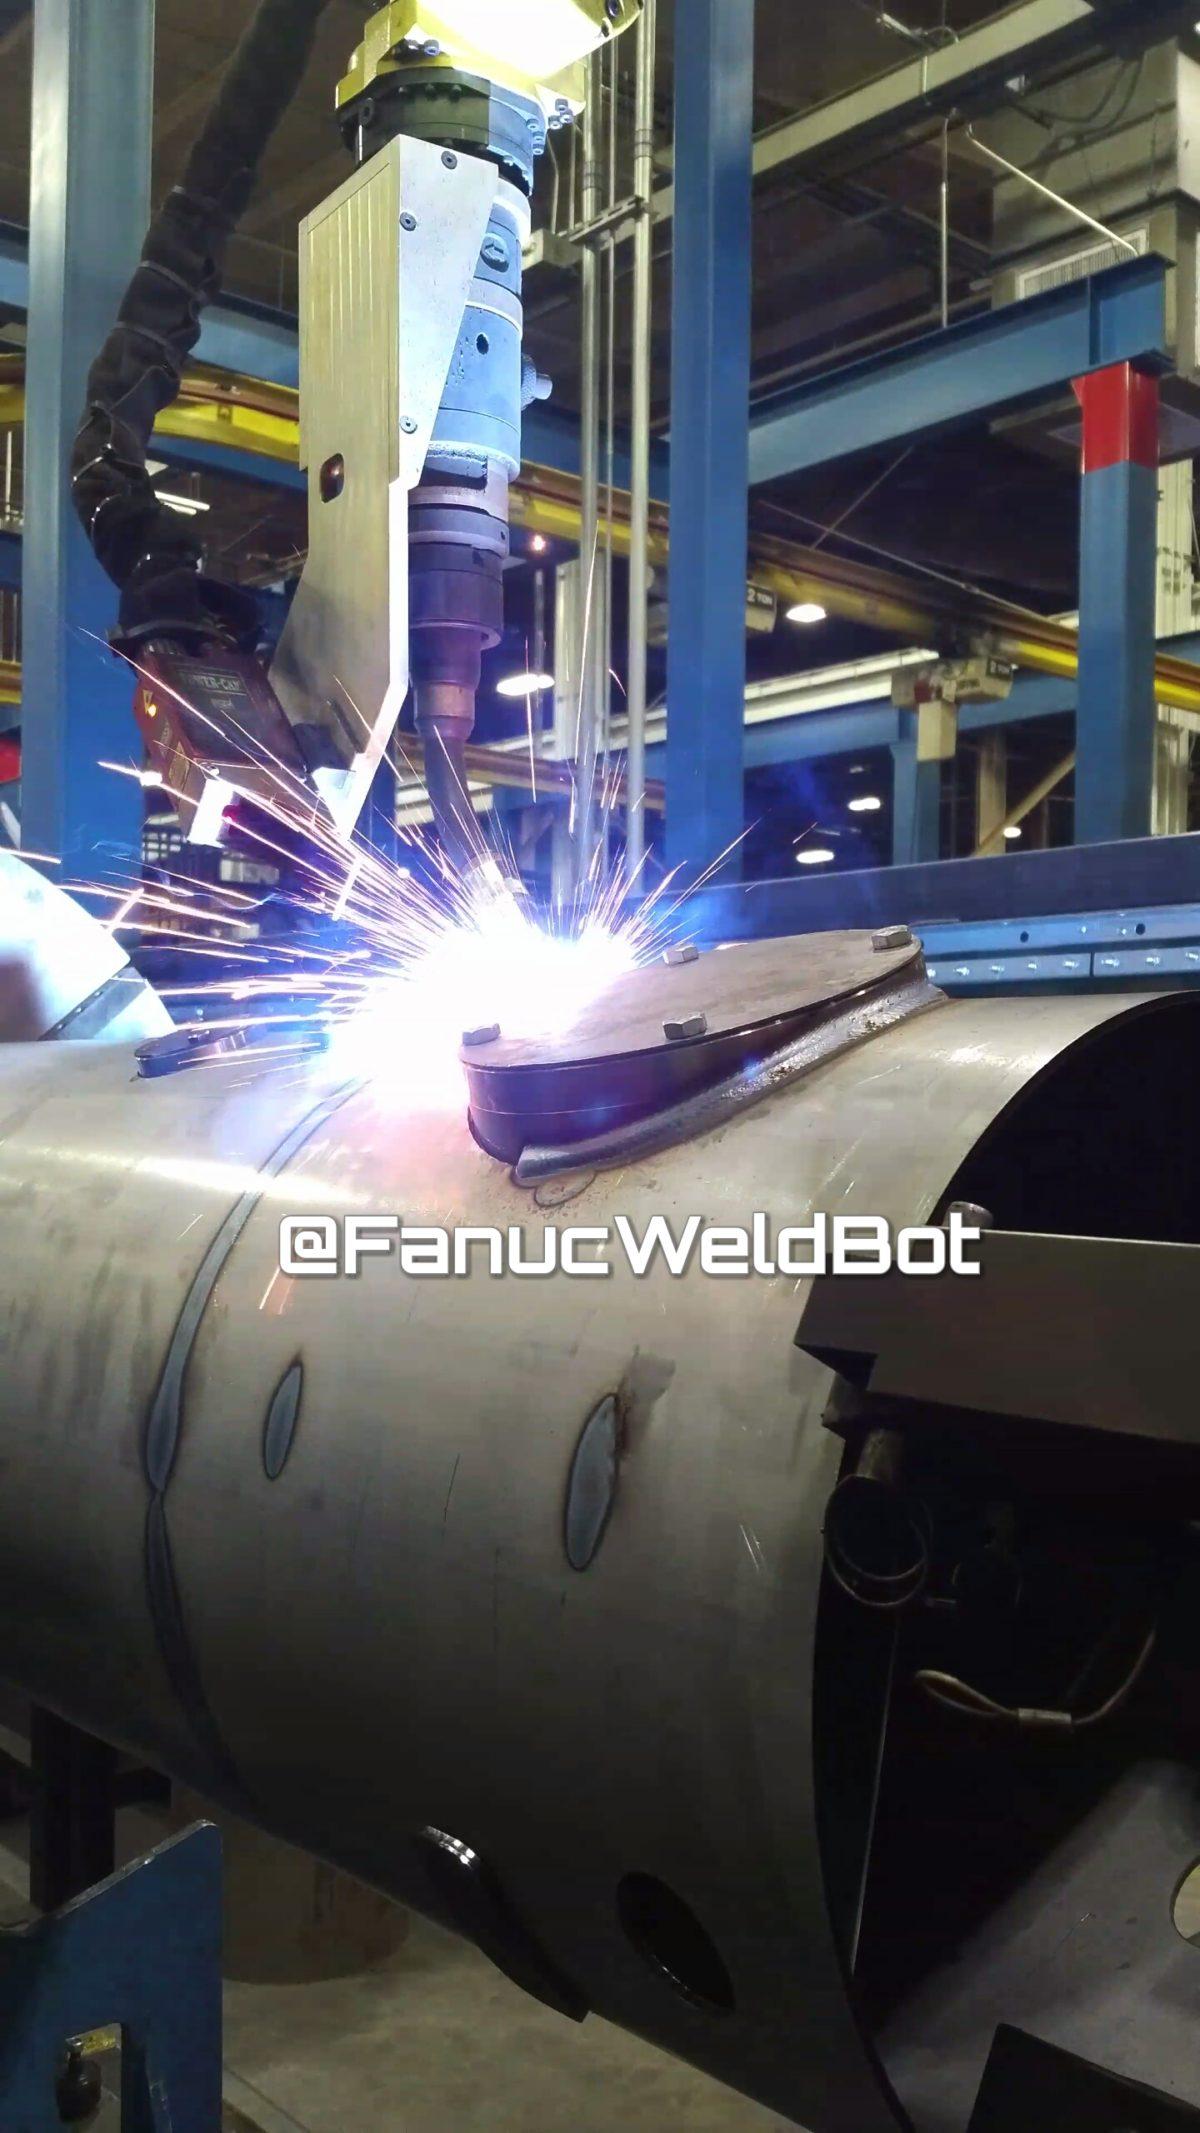 servo robot with fanuc robot